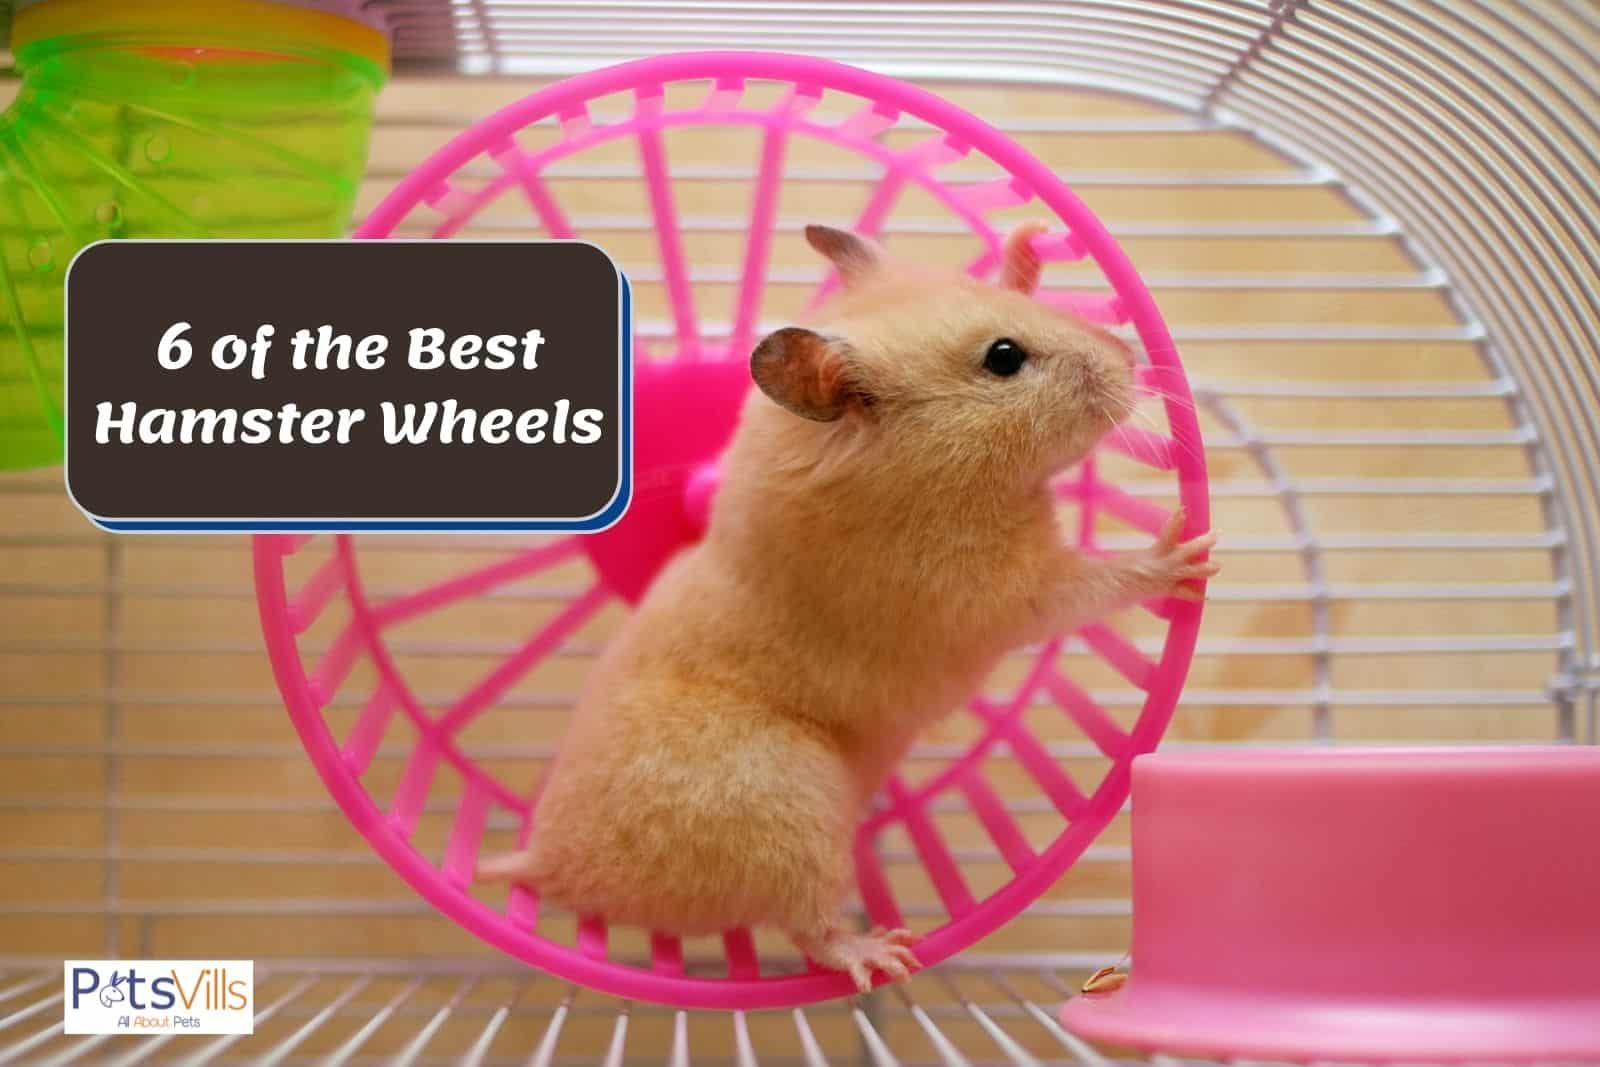 hamster running on her one of the best hamster wheels